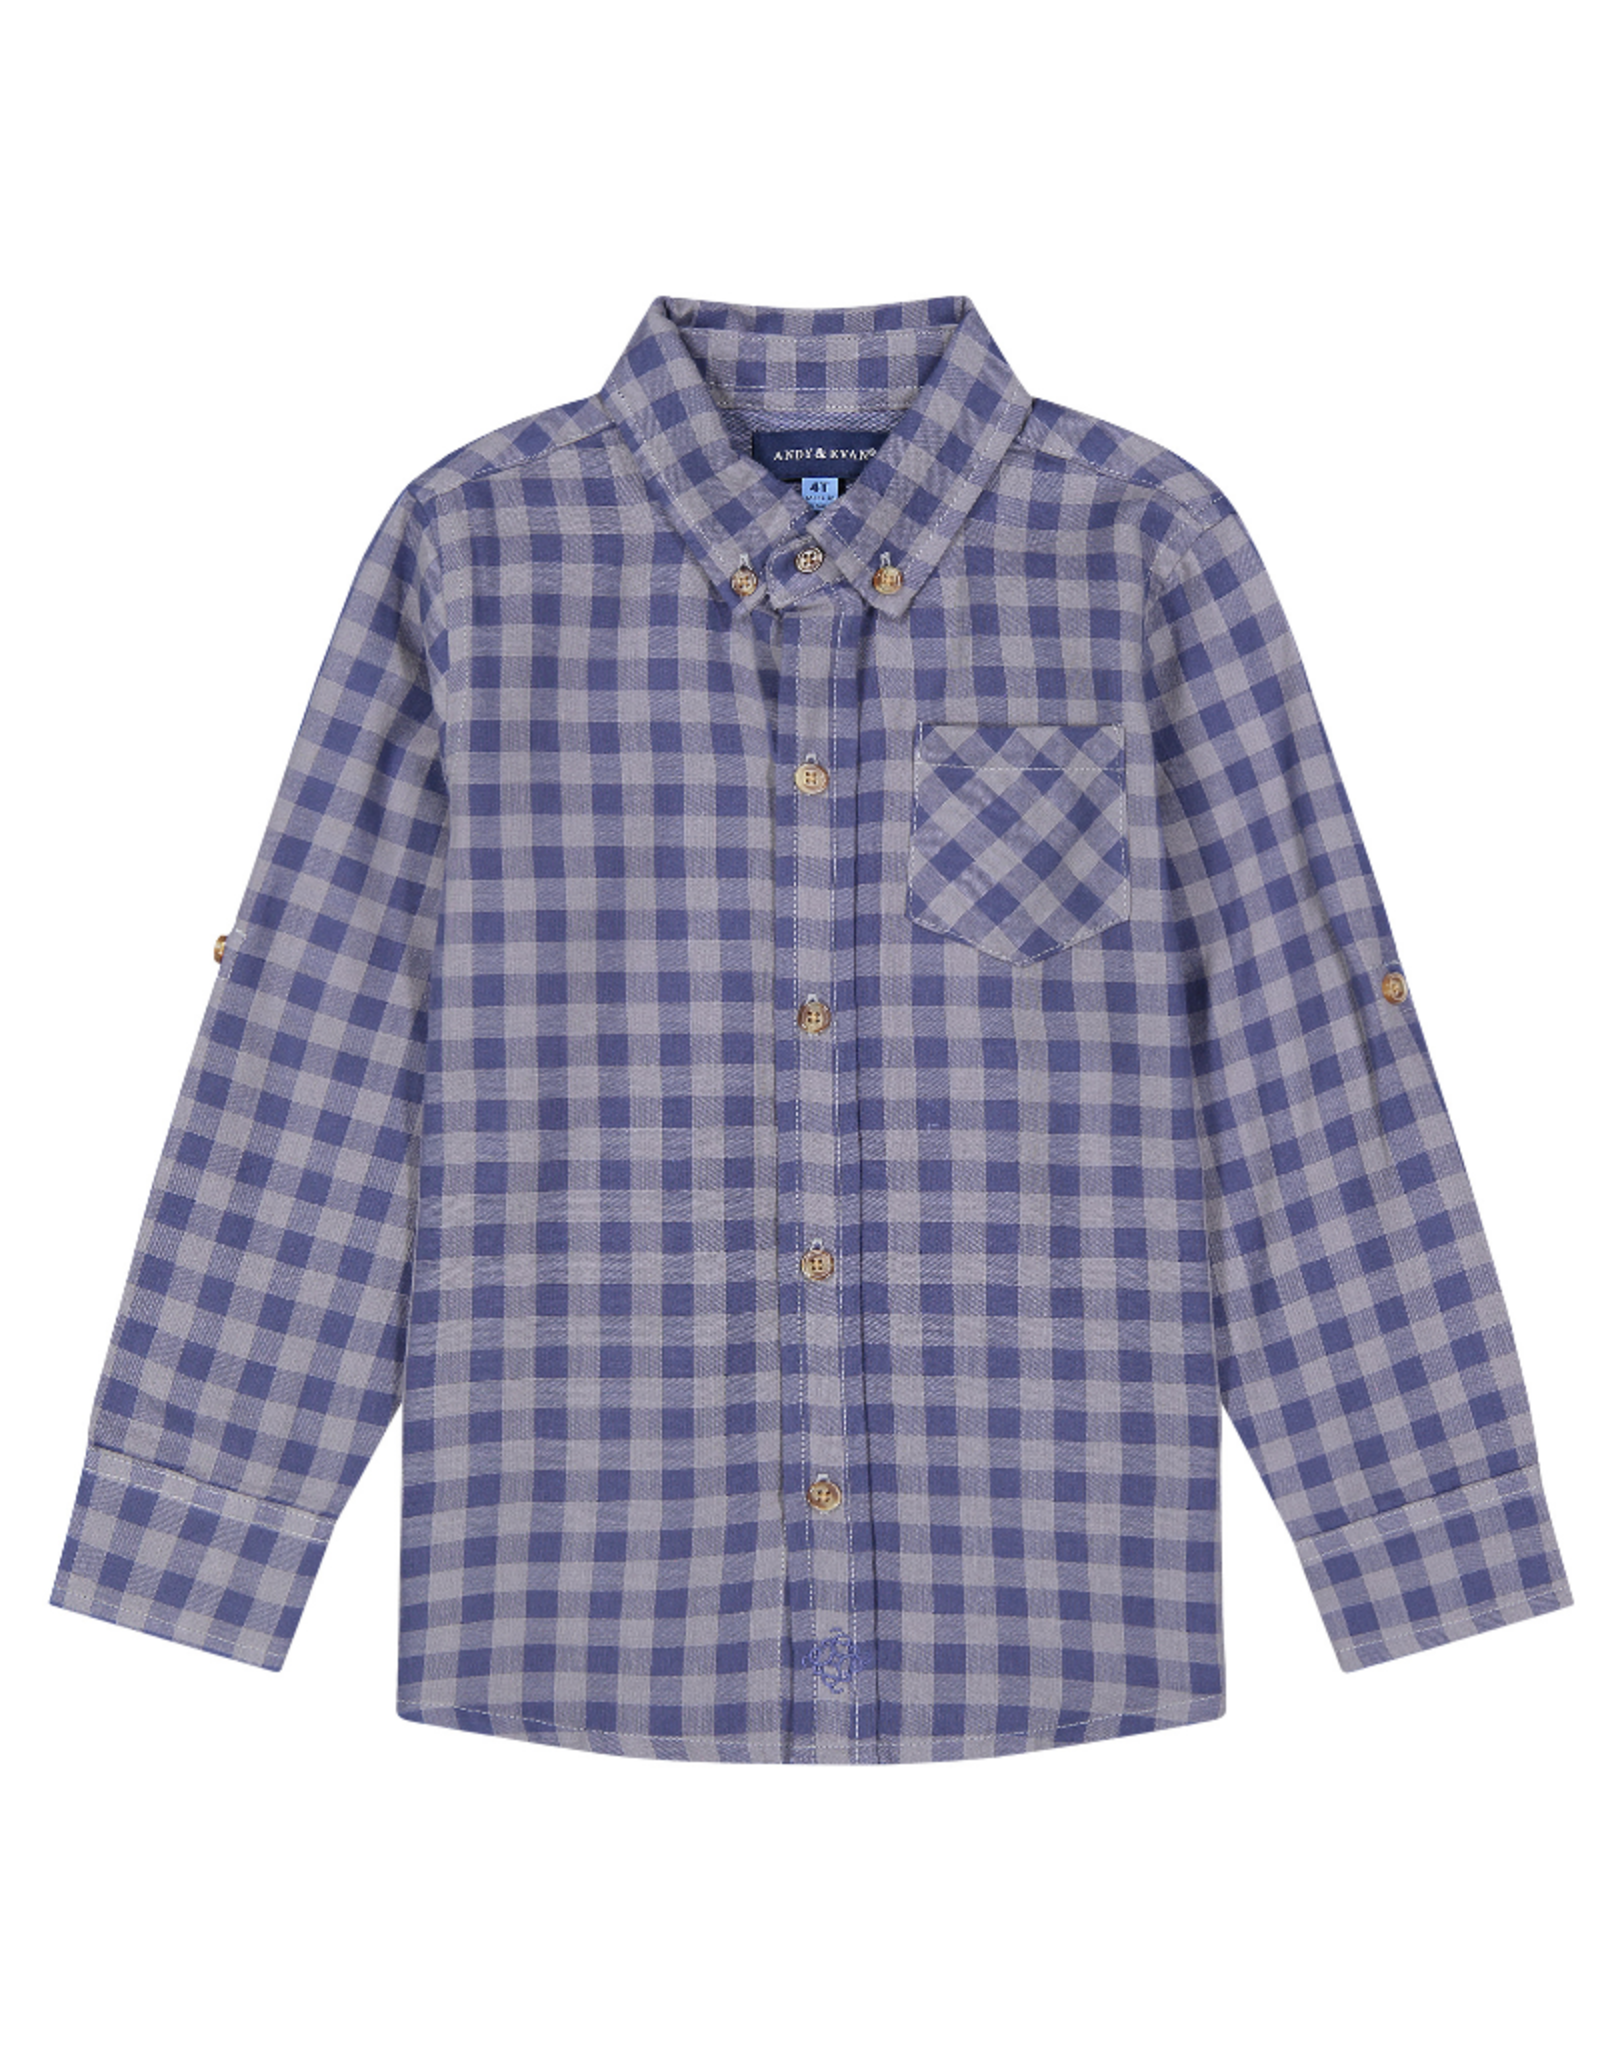 Andy & Evan Button Down Shirt, Blue Plaid